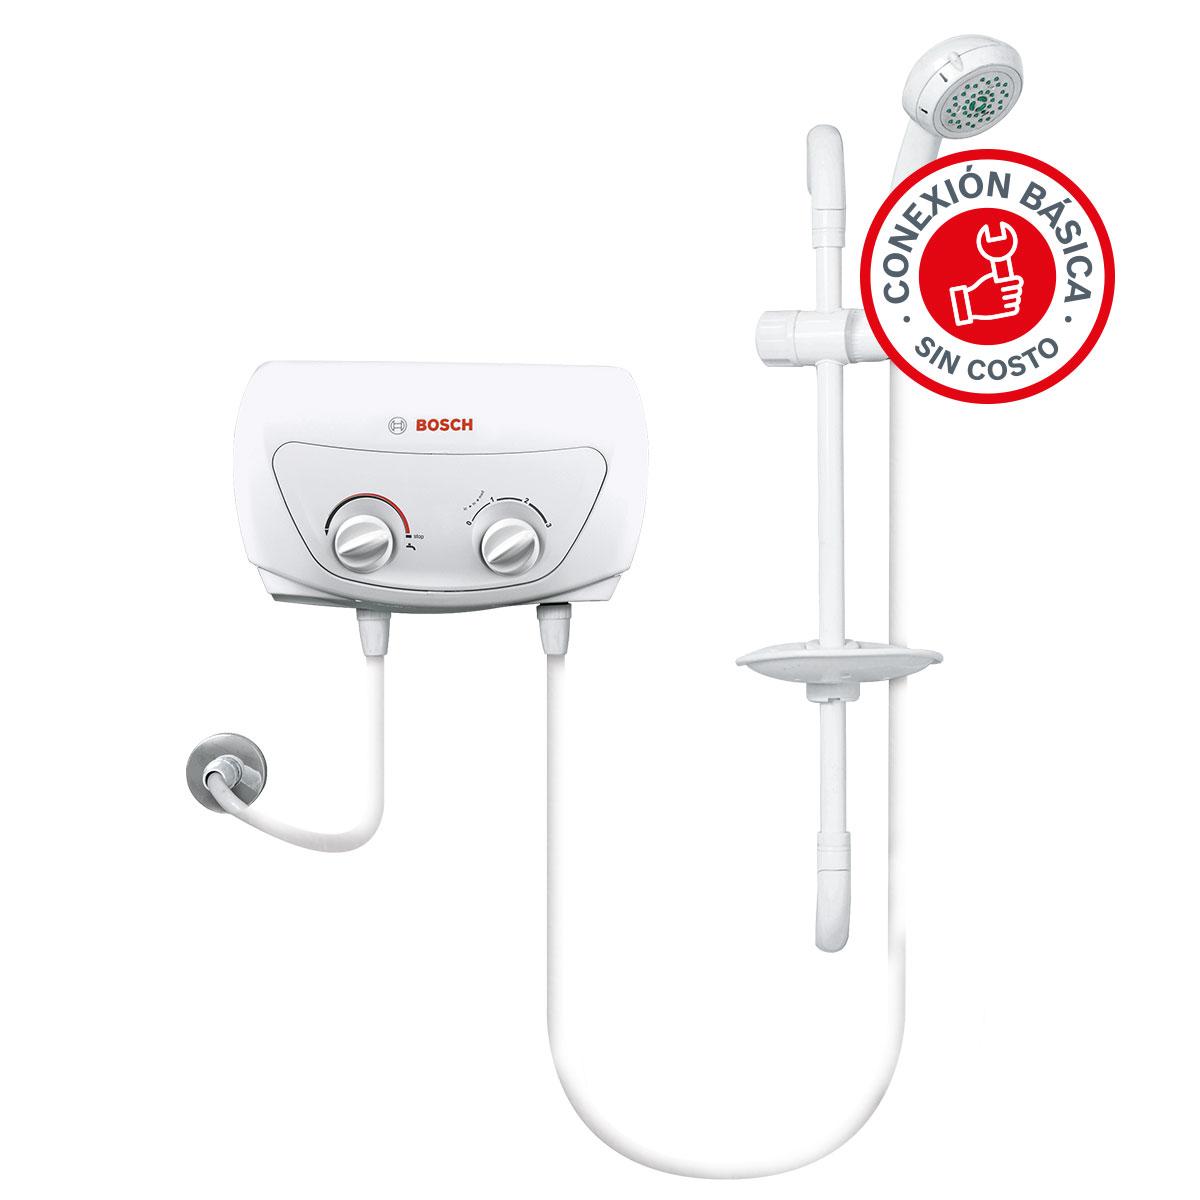 Regadera Electrica Automatica Tronic 3000s 3 Potencias Bosch